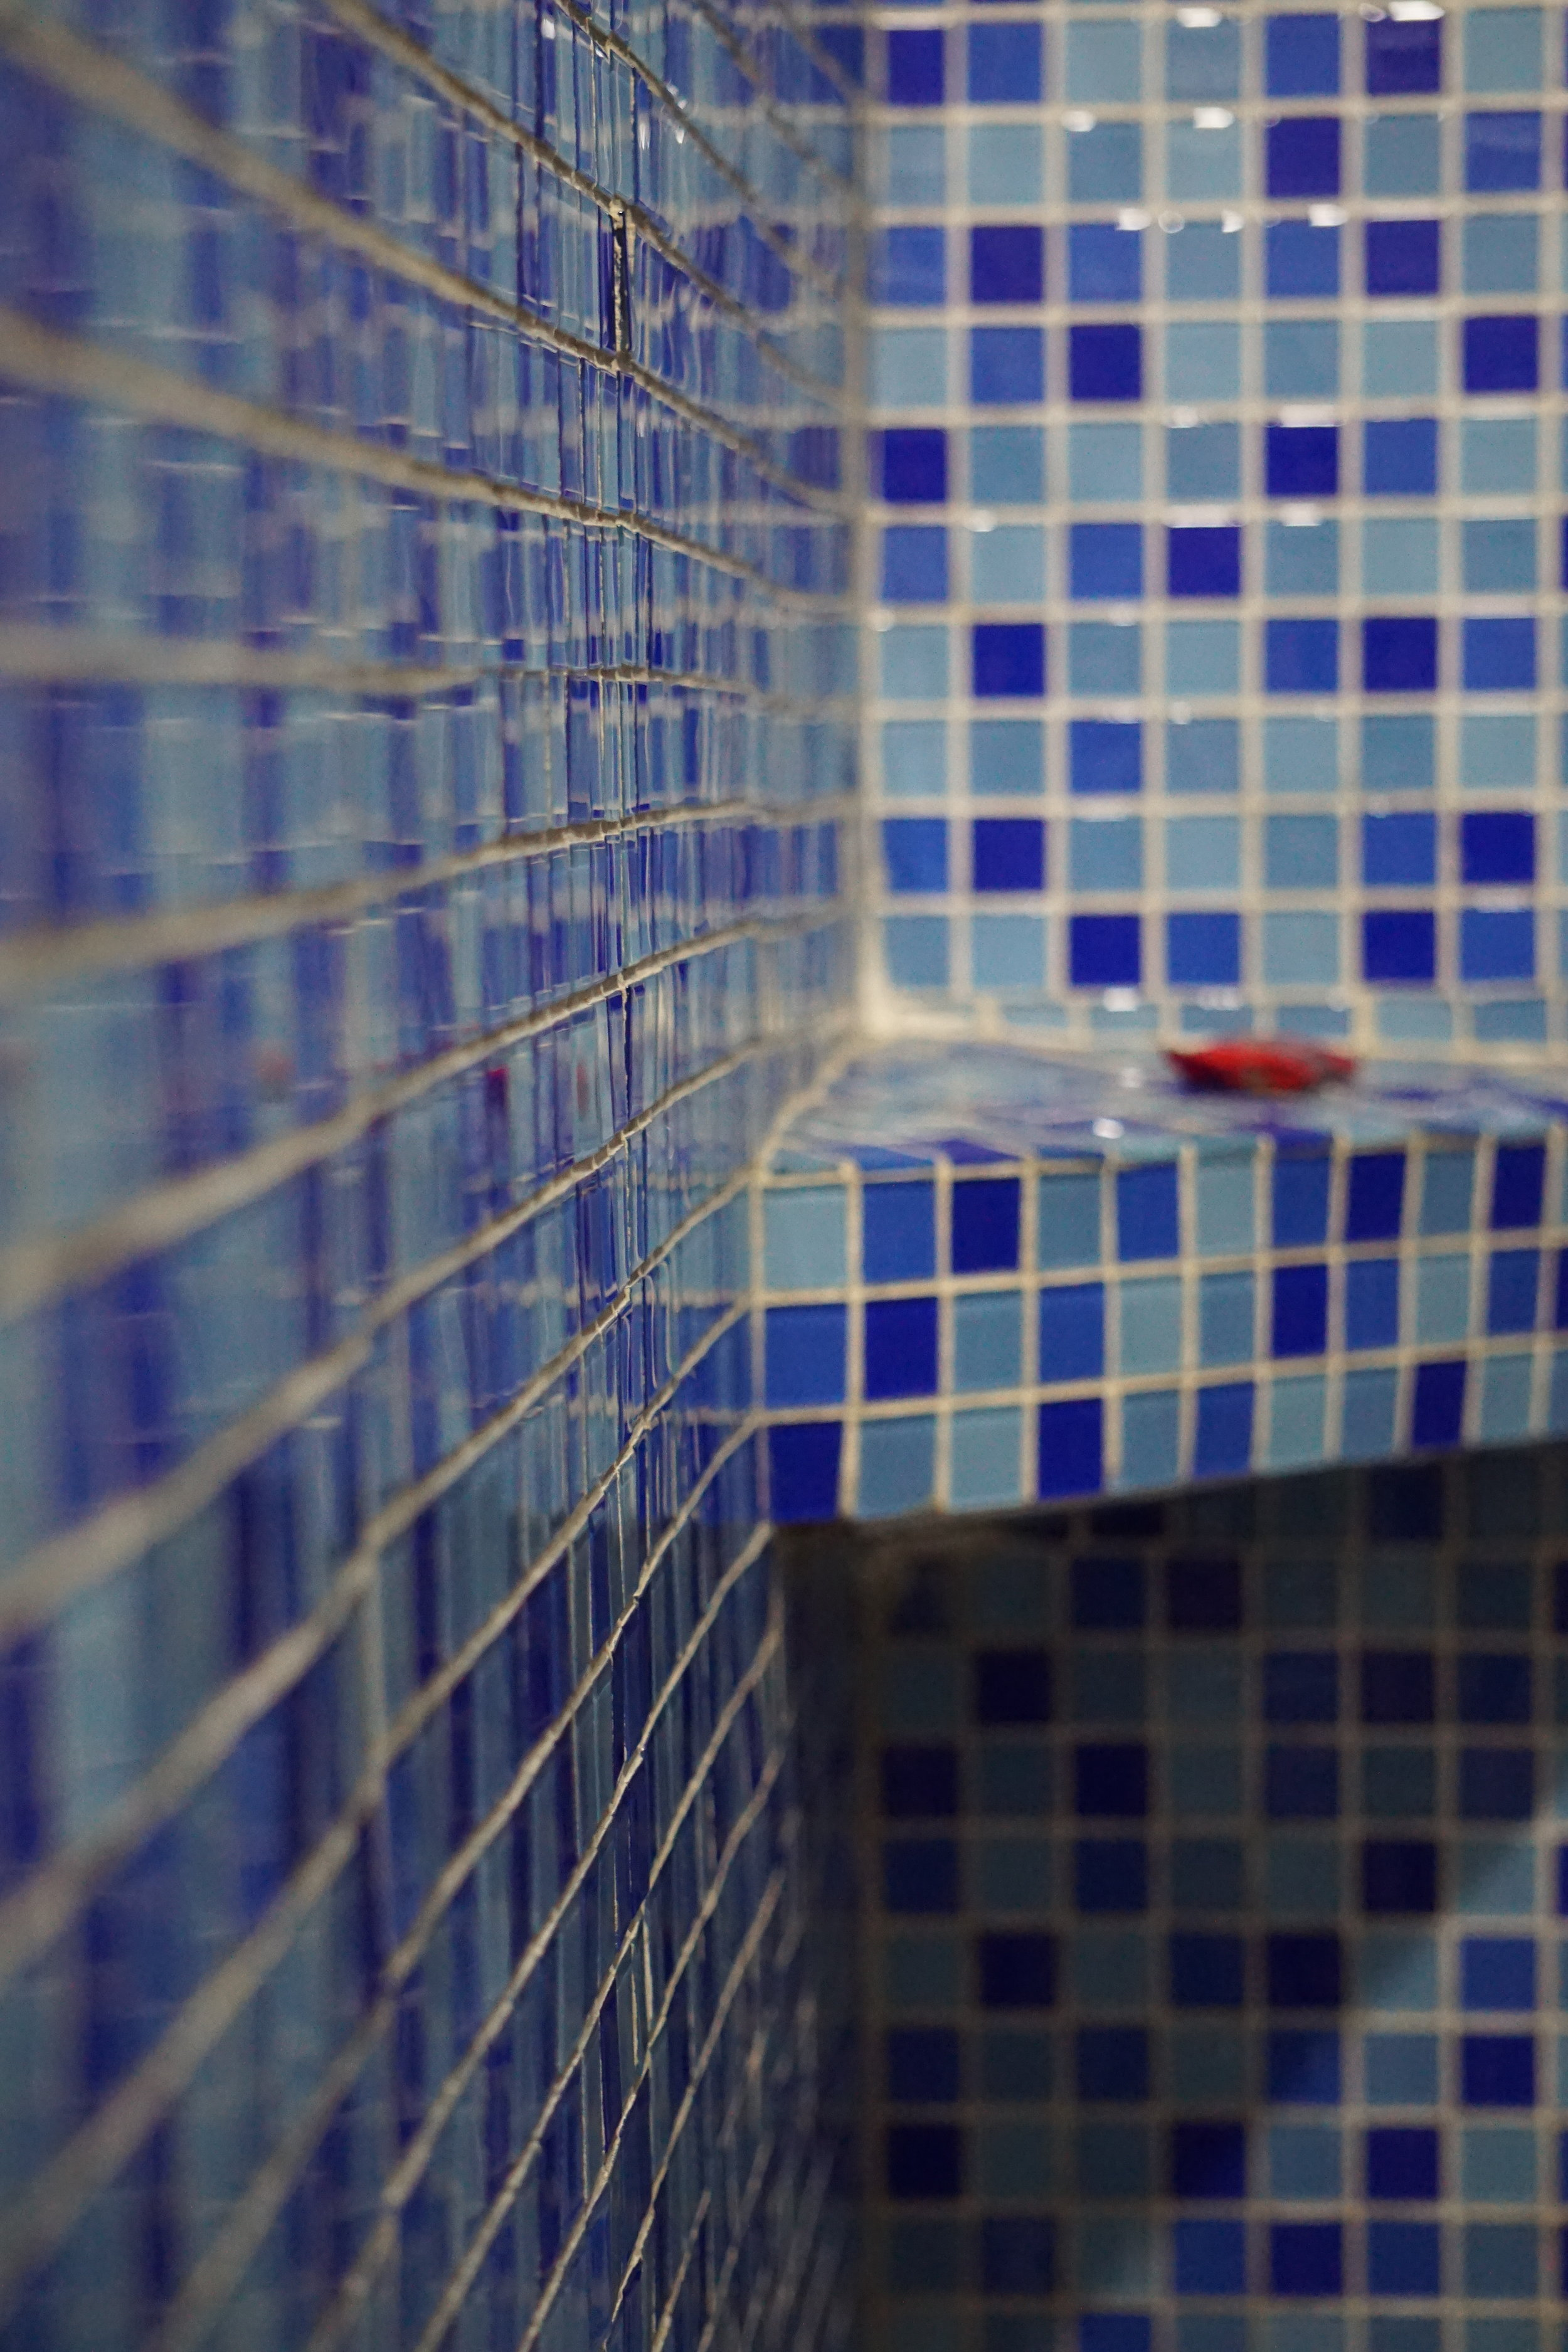 acommNoelsbathroom(1).JPG